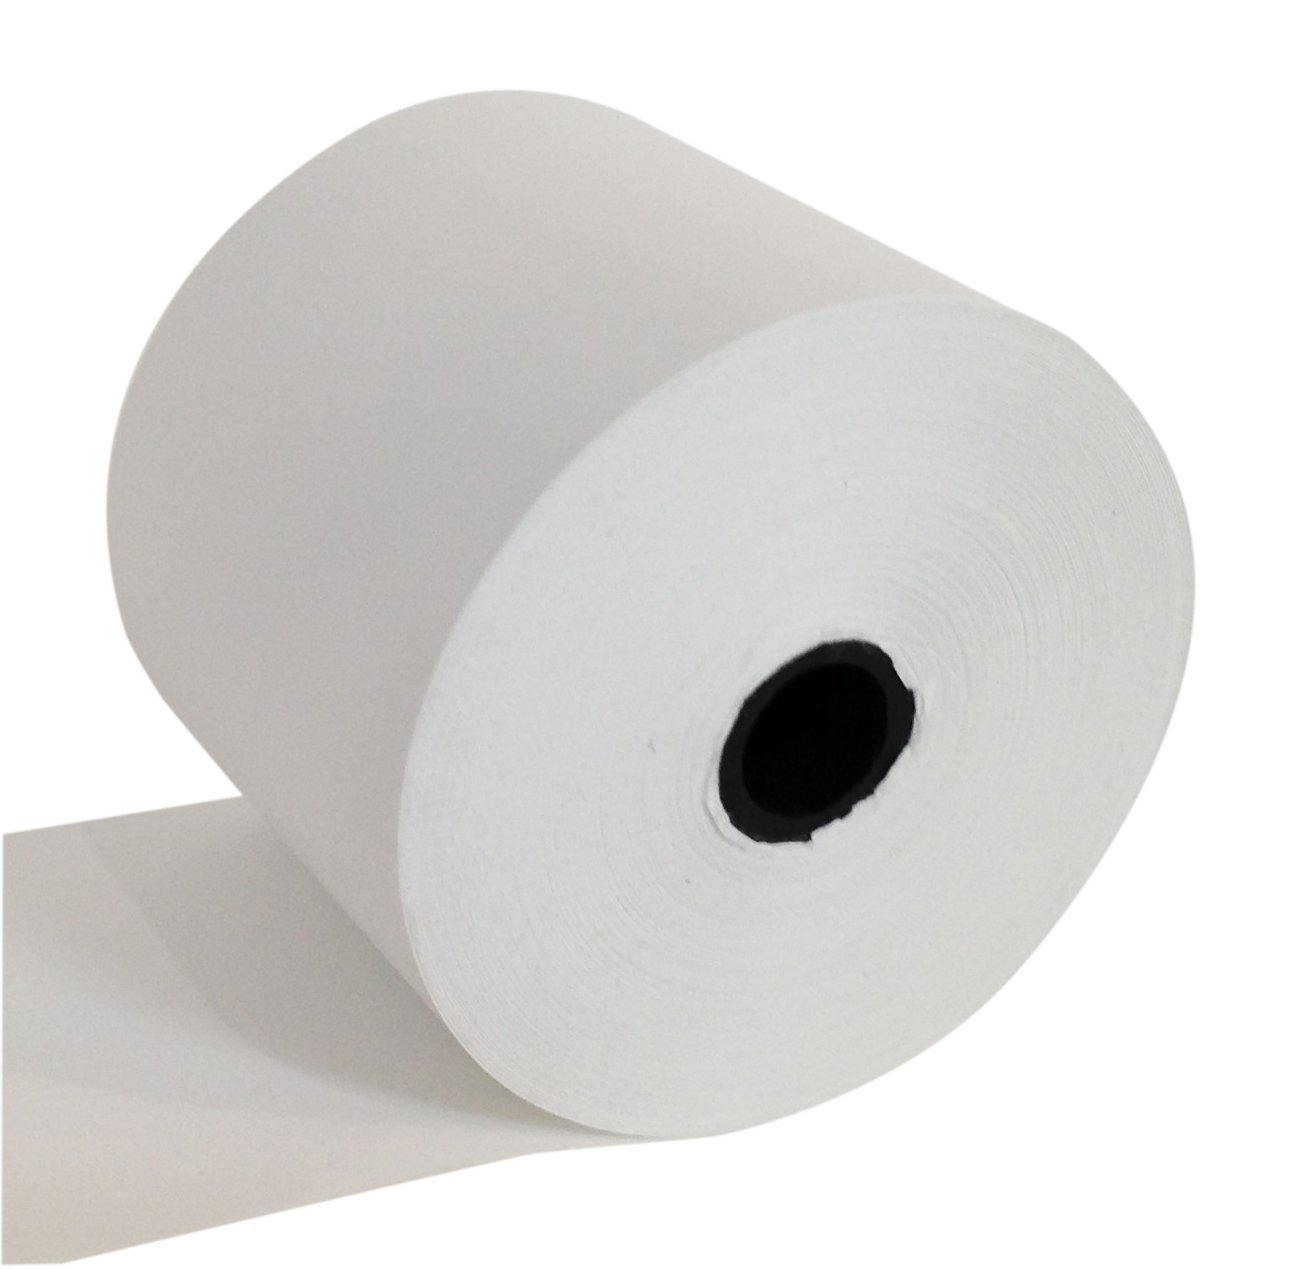 Nashua/RX Technologies POS Thermal Receipt Roll, Standard, 230-Feet Long, 2.25-Inch Wide, 50 per Case (8910)